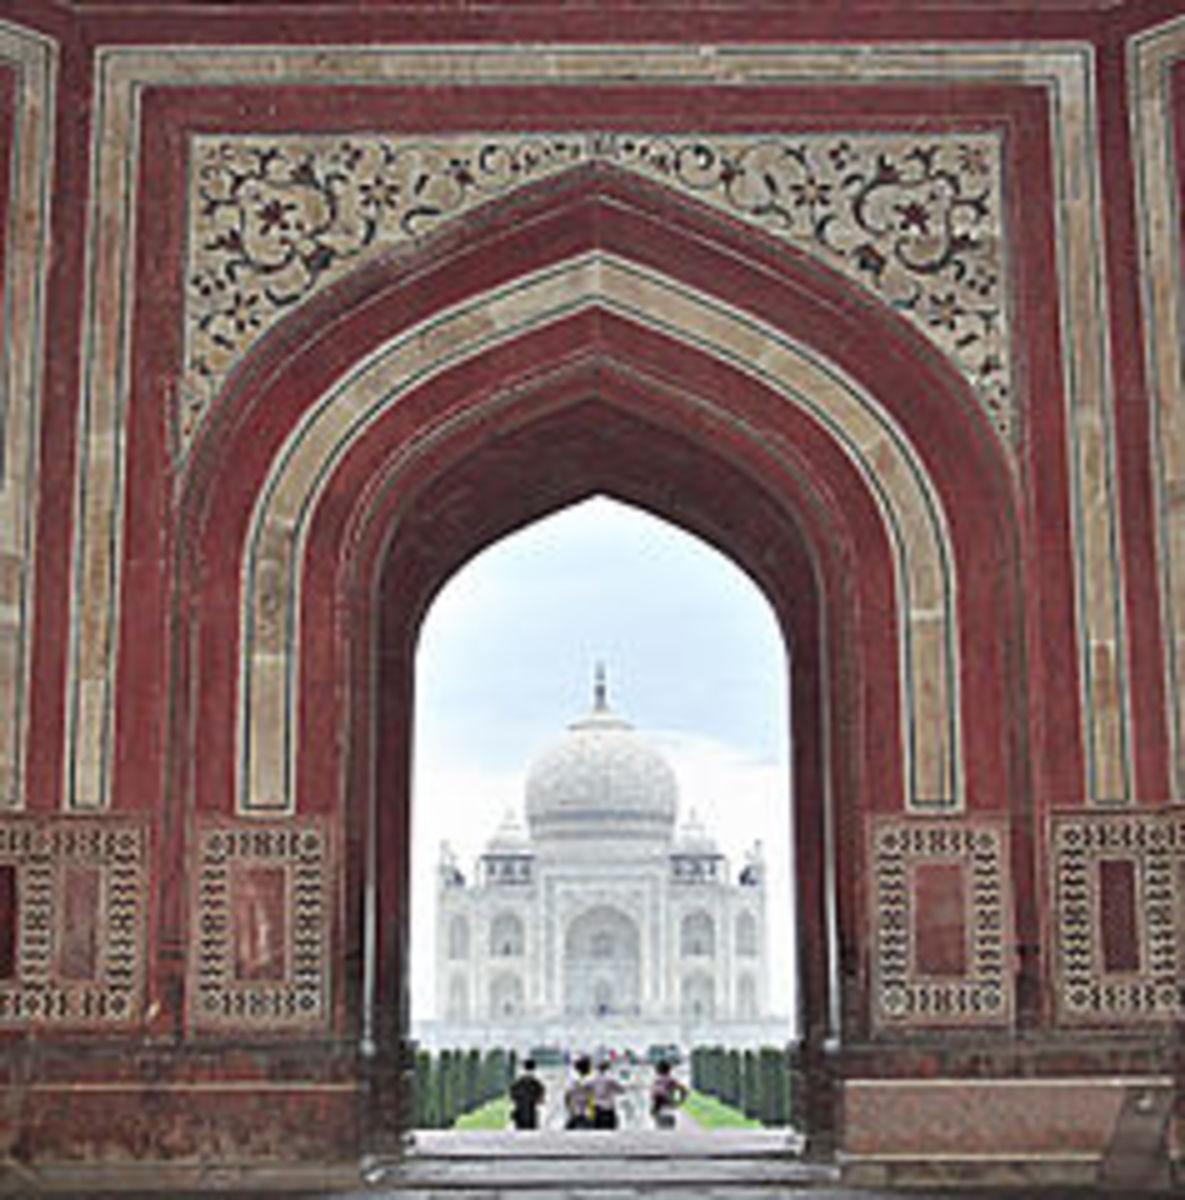 View of Taj Mahal Through the Entrance